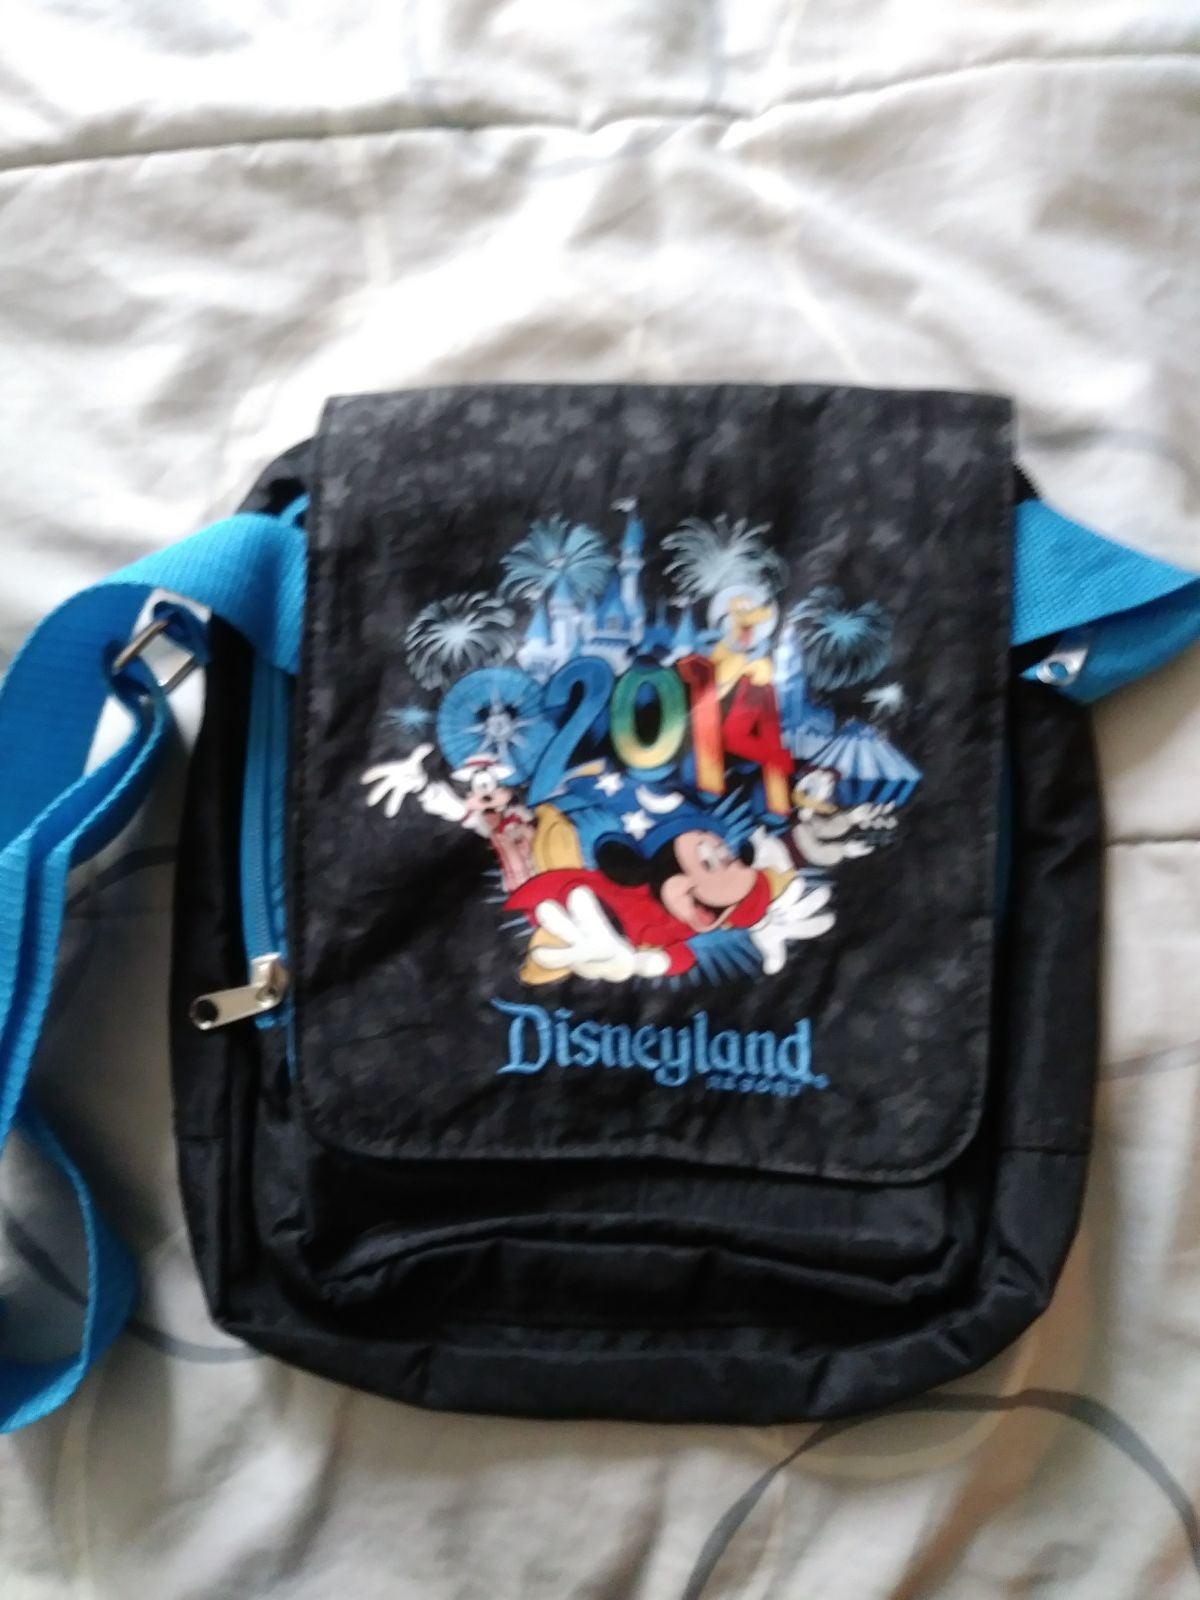 Disneyland bag